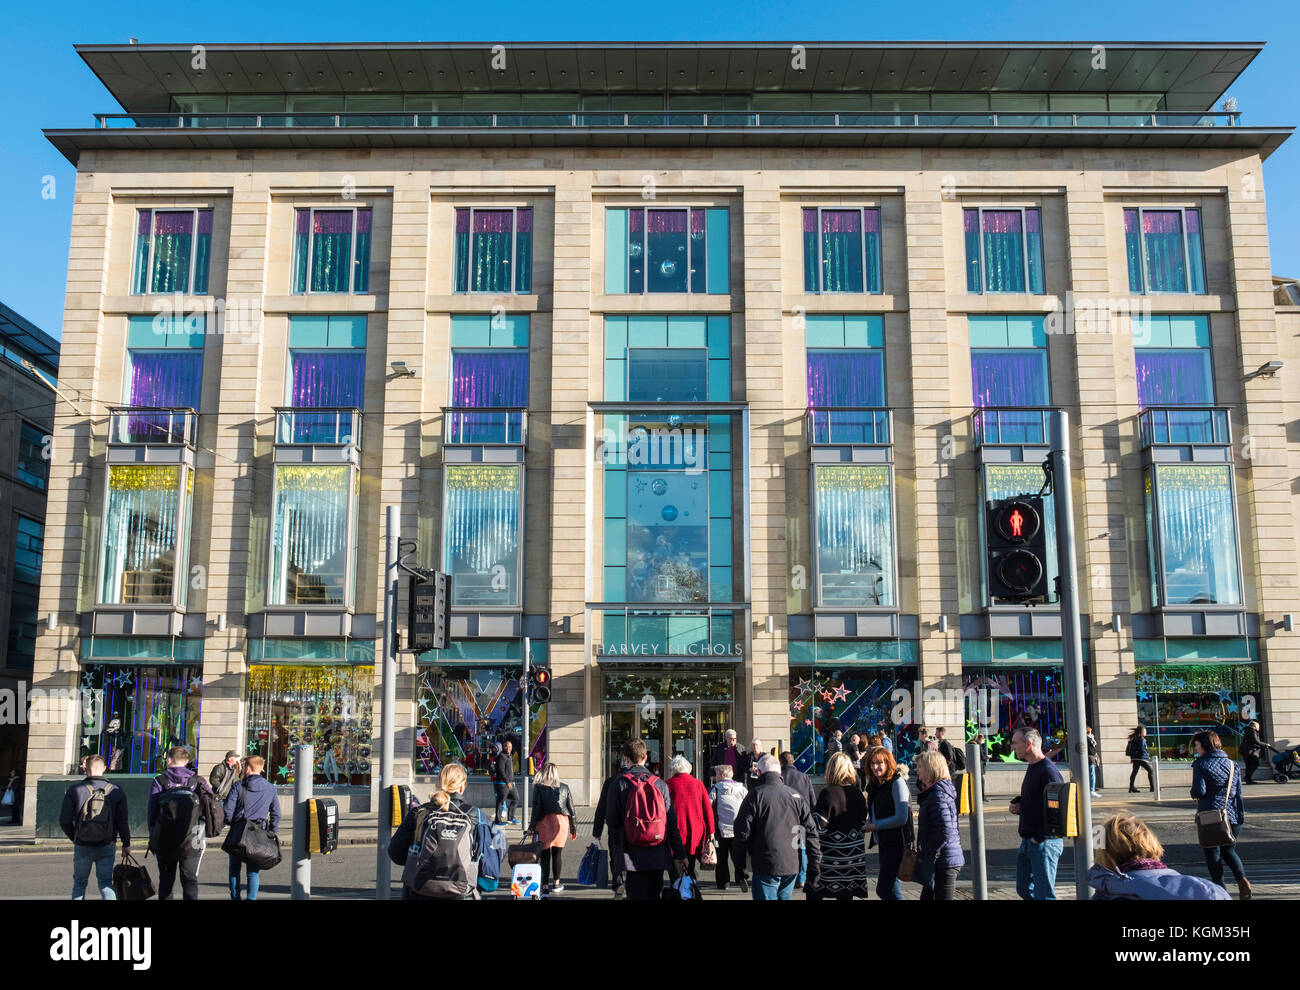 Exterior view of Harvey Nichols store on St Andrews Square in Edinburgh, Scotland, United Kingdom. - Stock Image